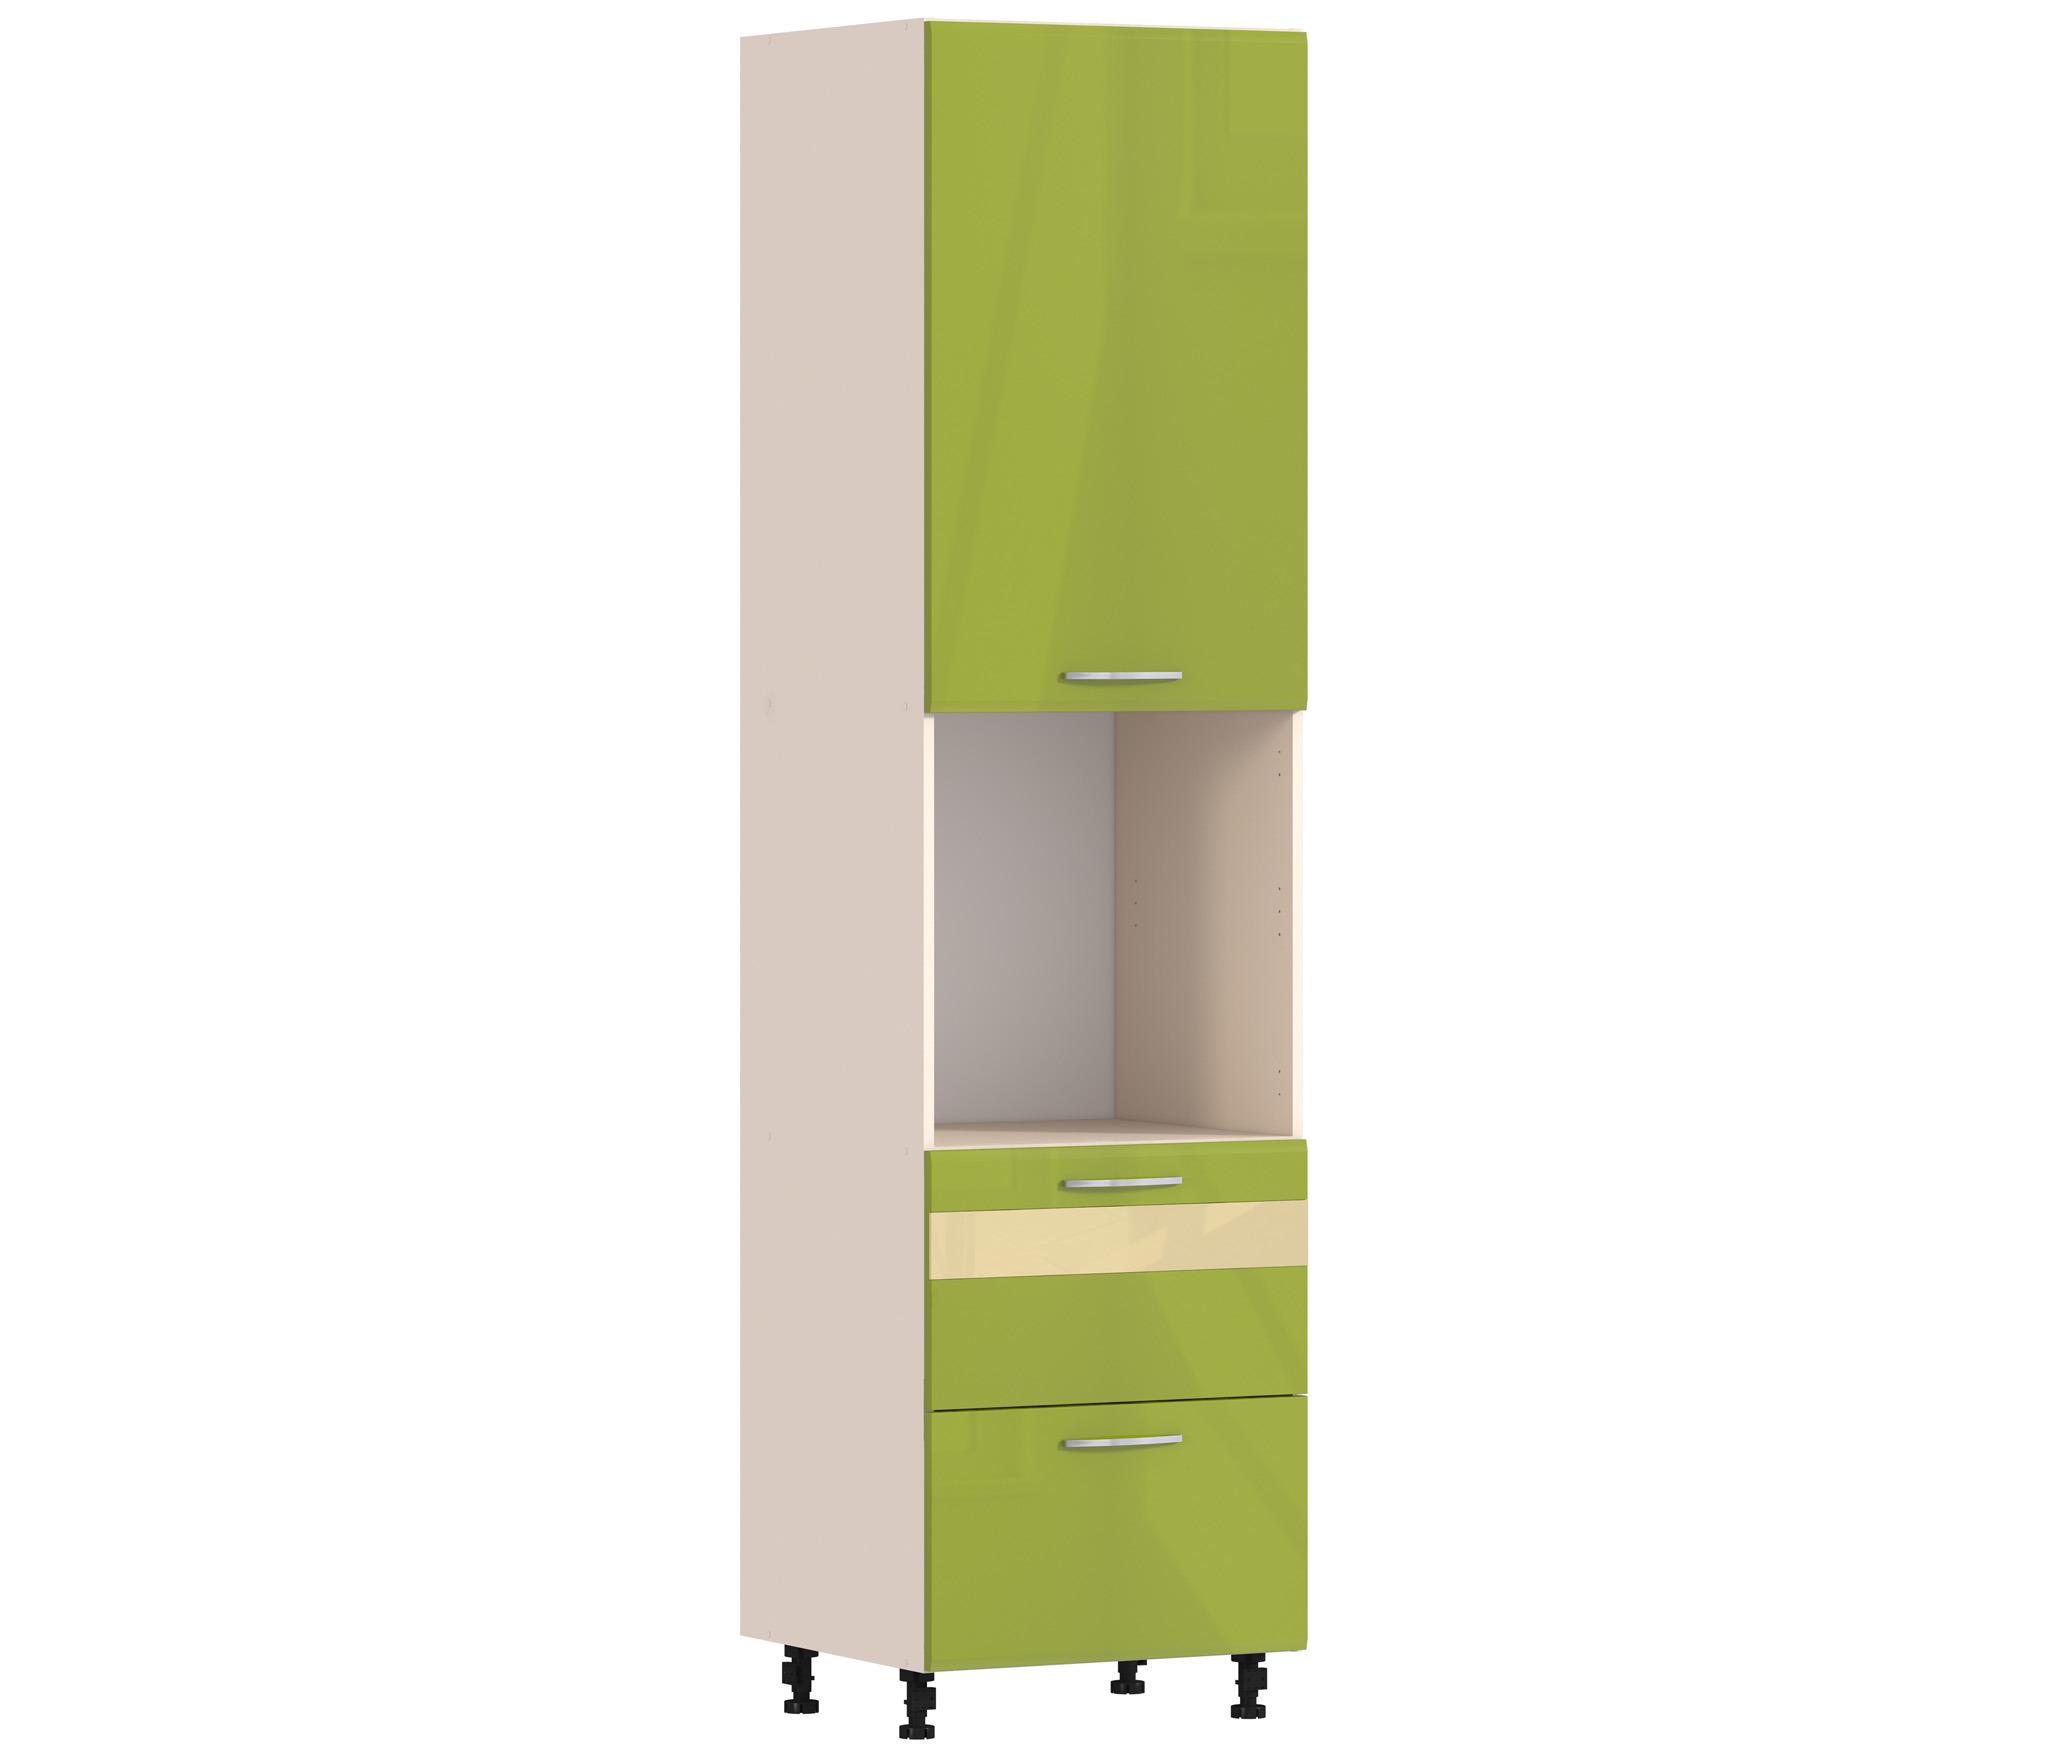 Регина РП-760 Пенал под духовкуМебель для кухни<br><br><br>Длина мм: 0<br>Высота мм: 0<br>Глубина мм: 0